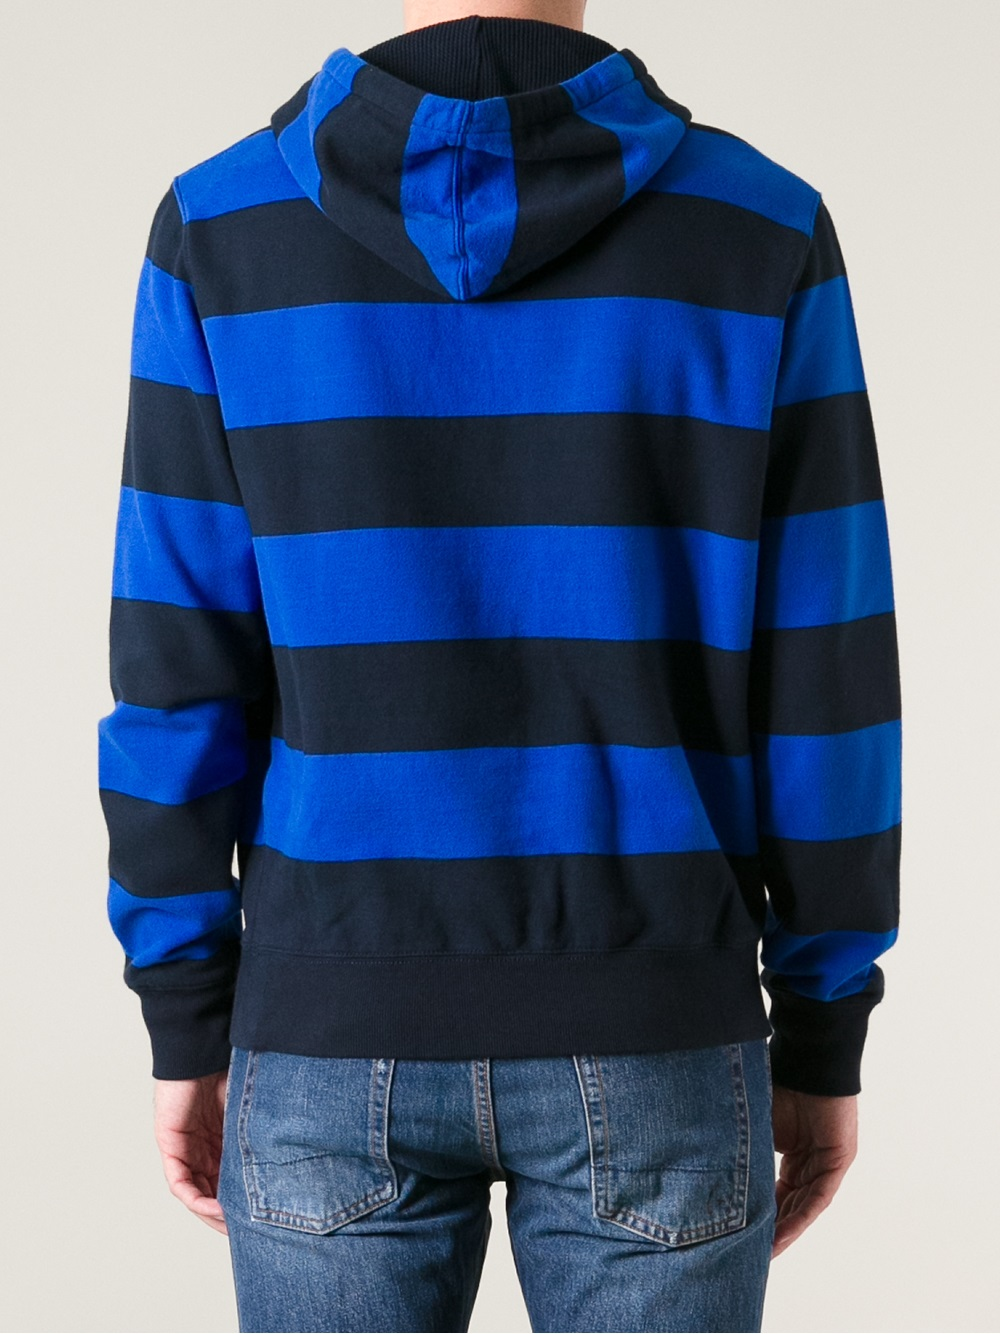 polo ralph lauren striped hoodie in blue for men lyst. Black Bedroom Furniture Sets. Home Design Ideas